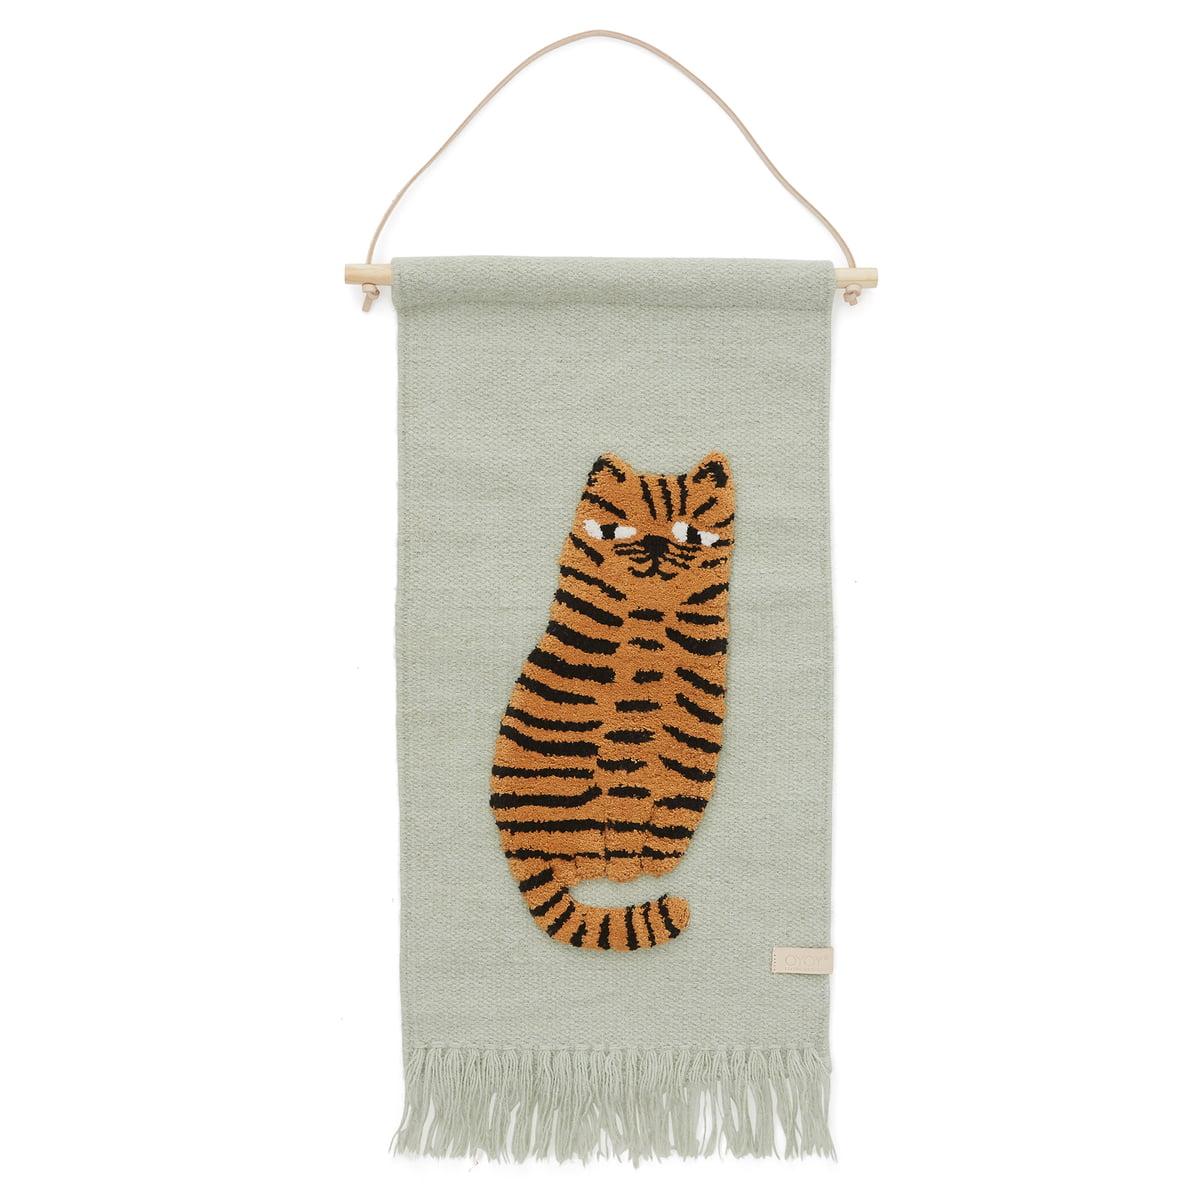 OYOY - Kinder-Wandteppich mit Tiermotiv, Tiger / grün